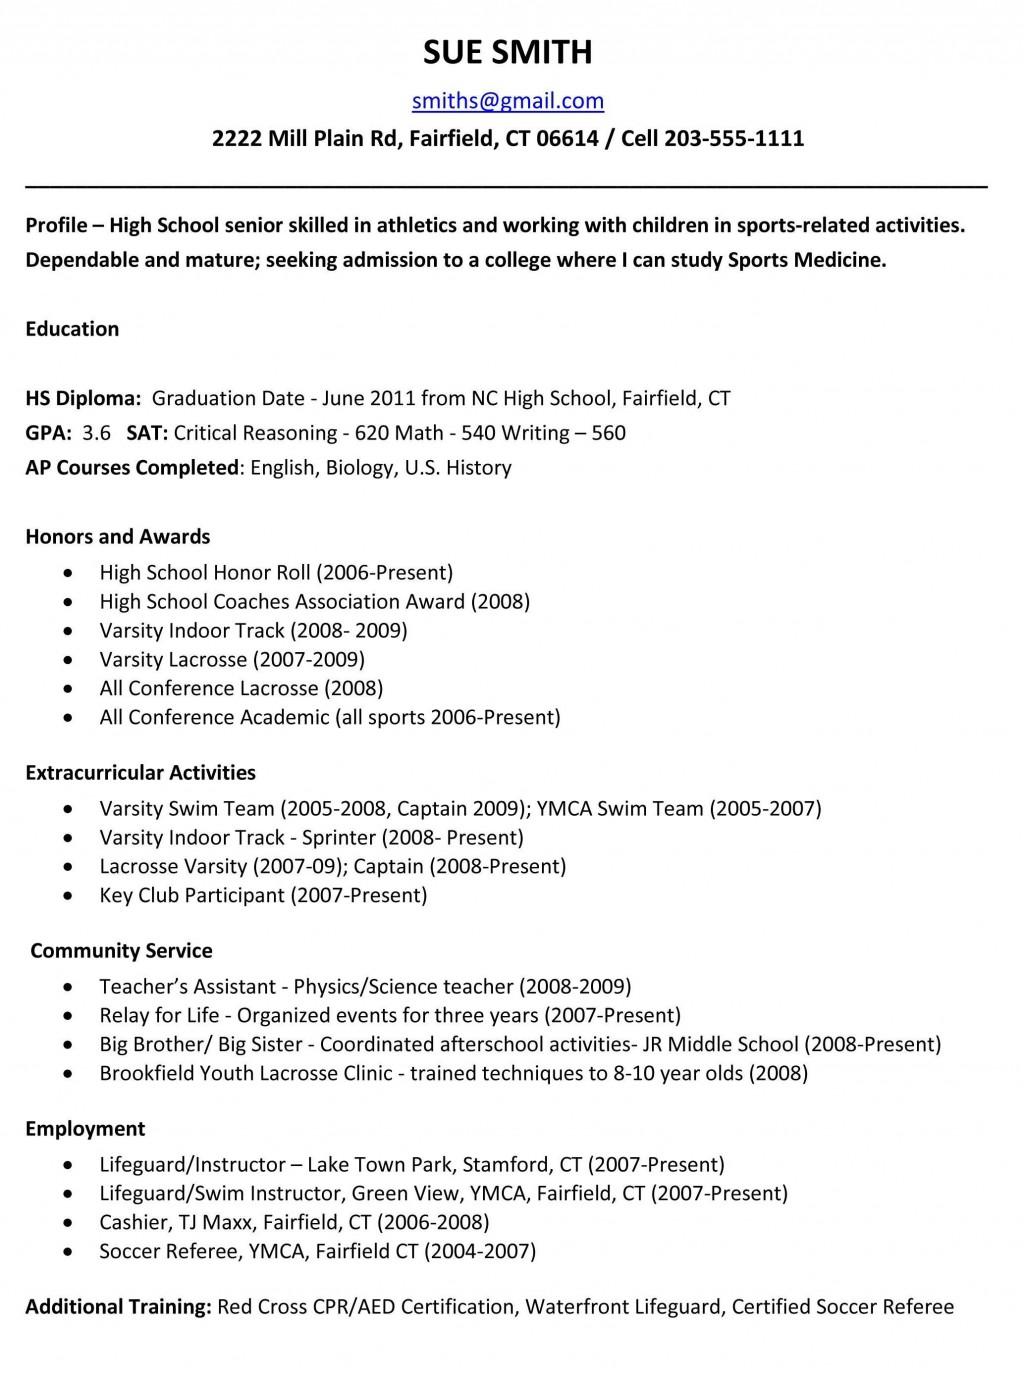 004 Astounding High School Student Resume Template Idea  Free Microsoft Word 2010Large